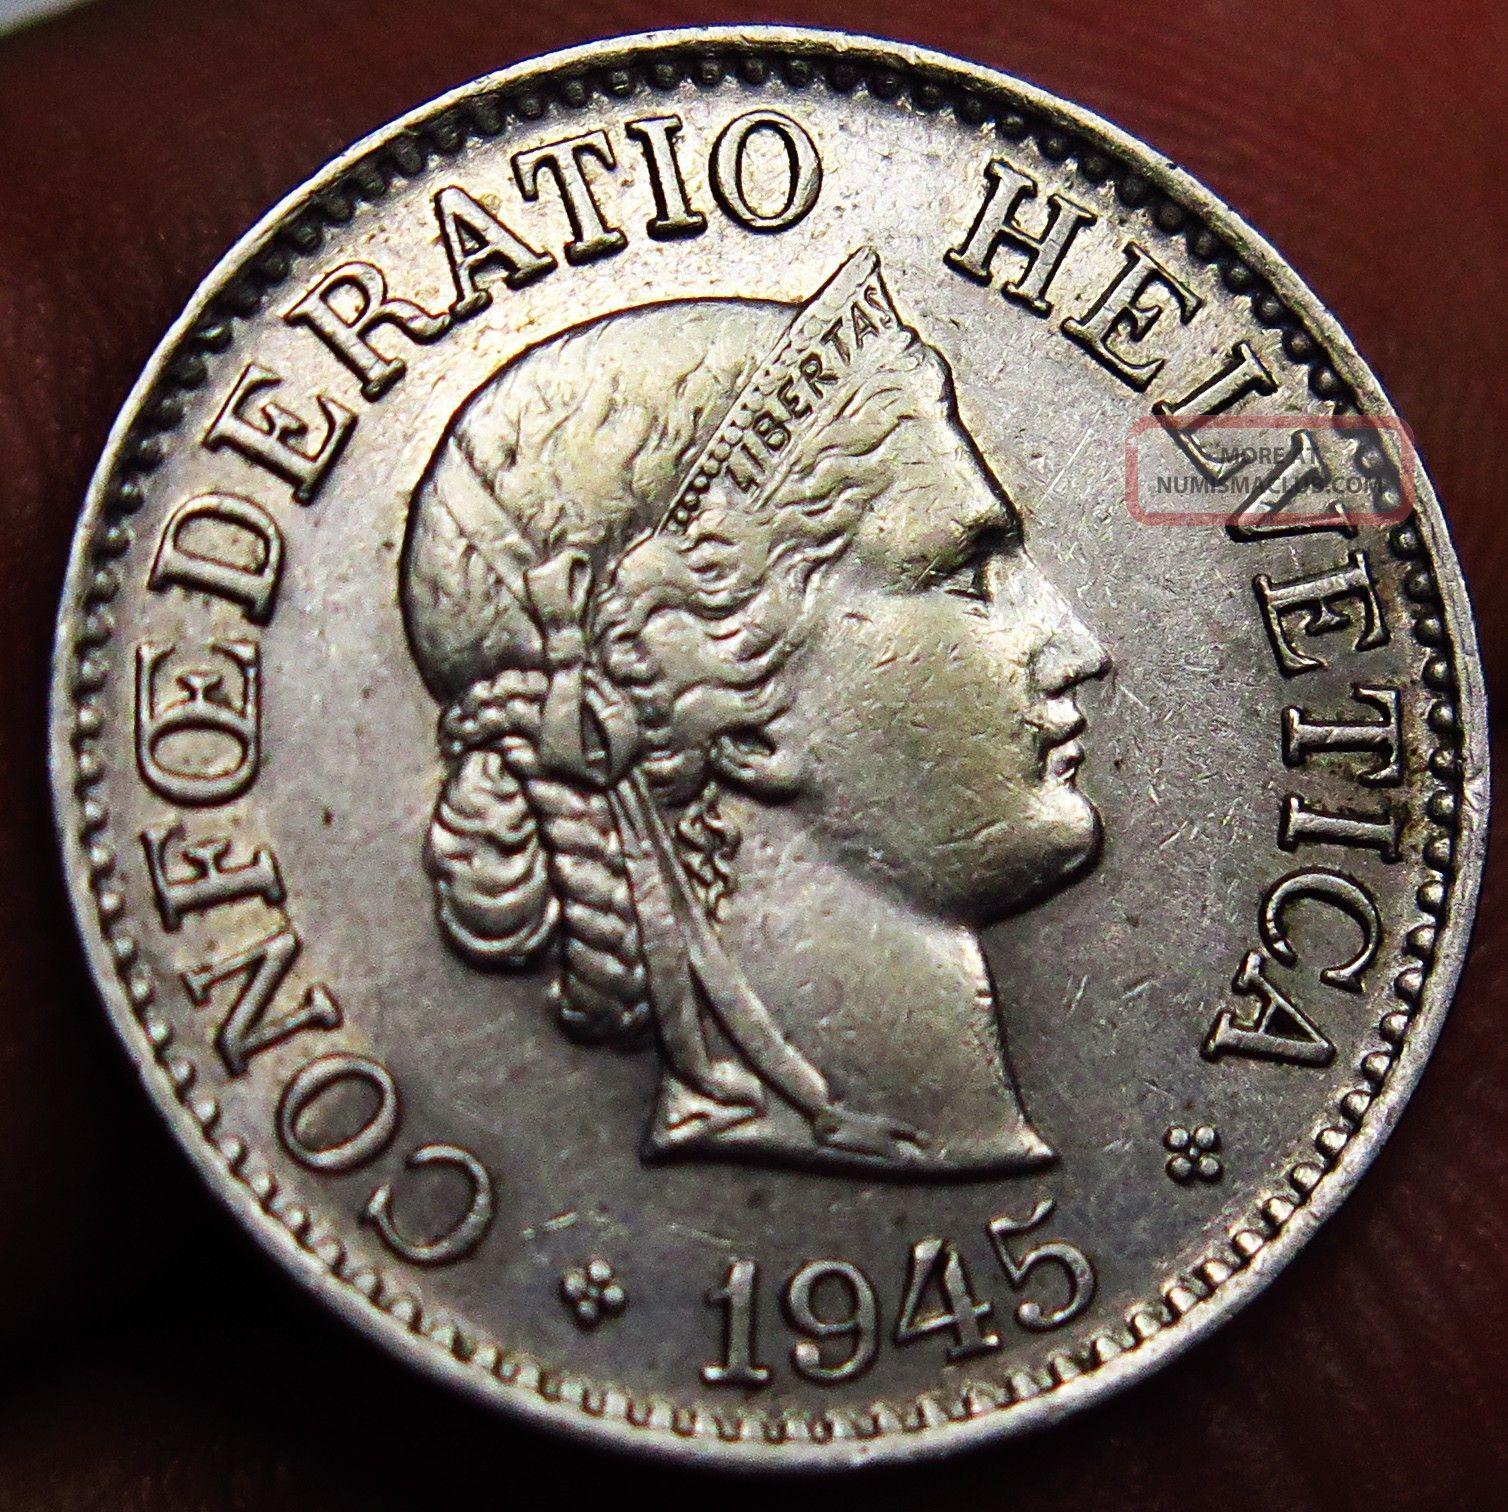 1945 Switzerland 10 Rappen Unc Very Low Mintage